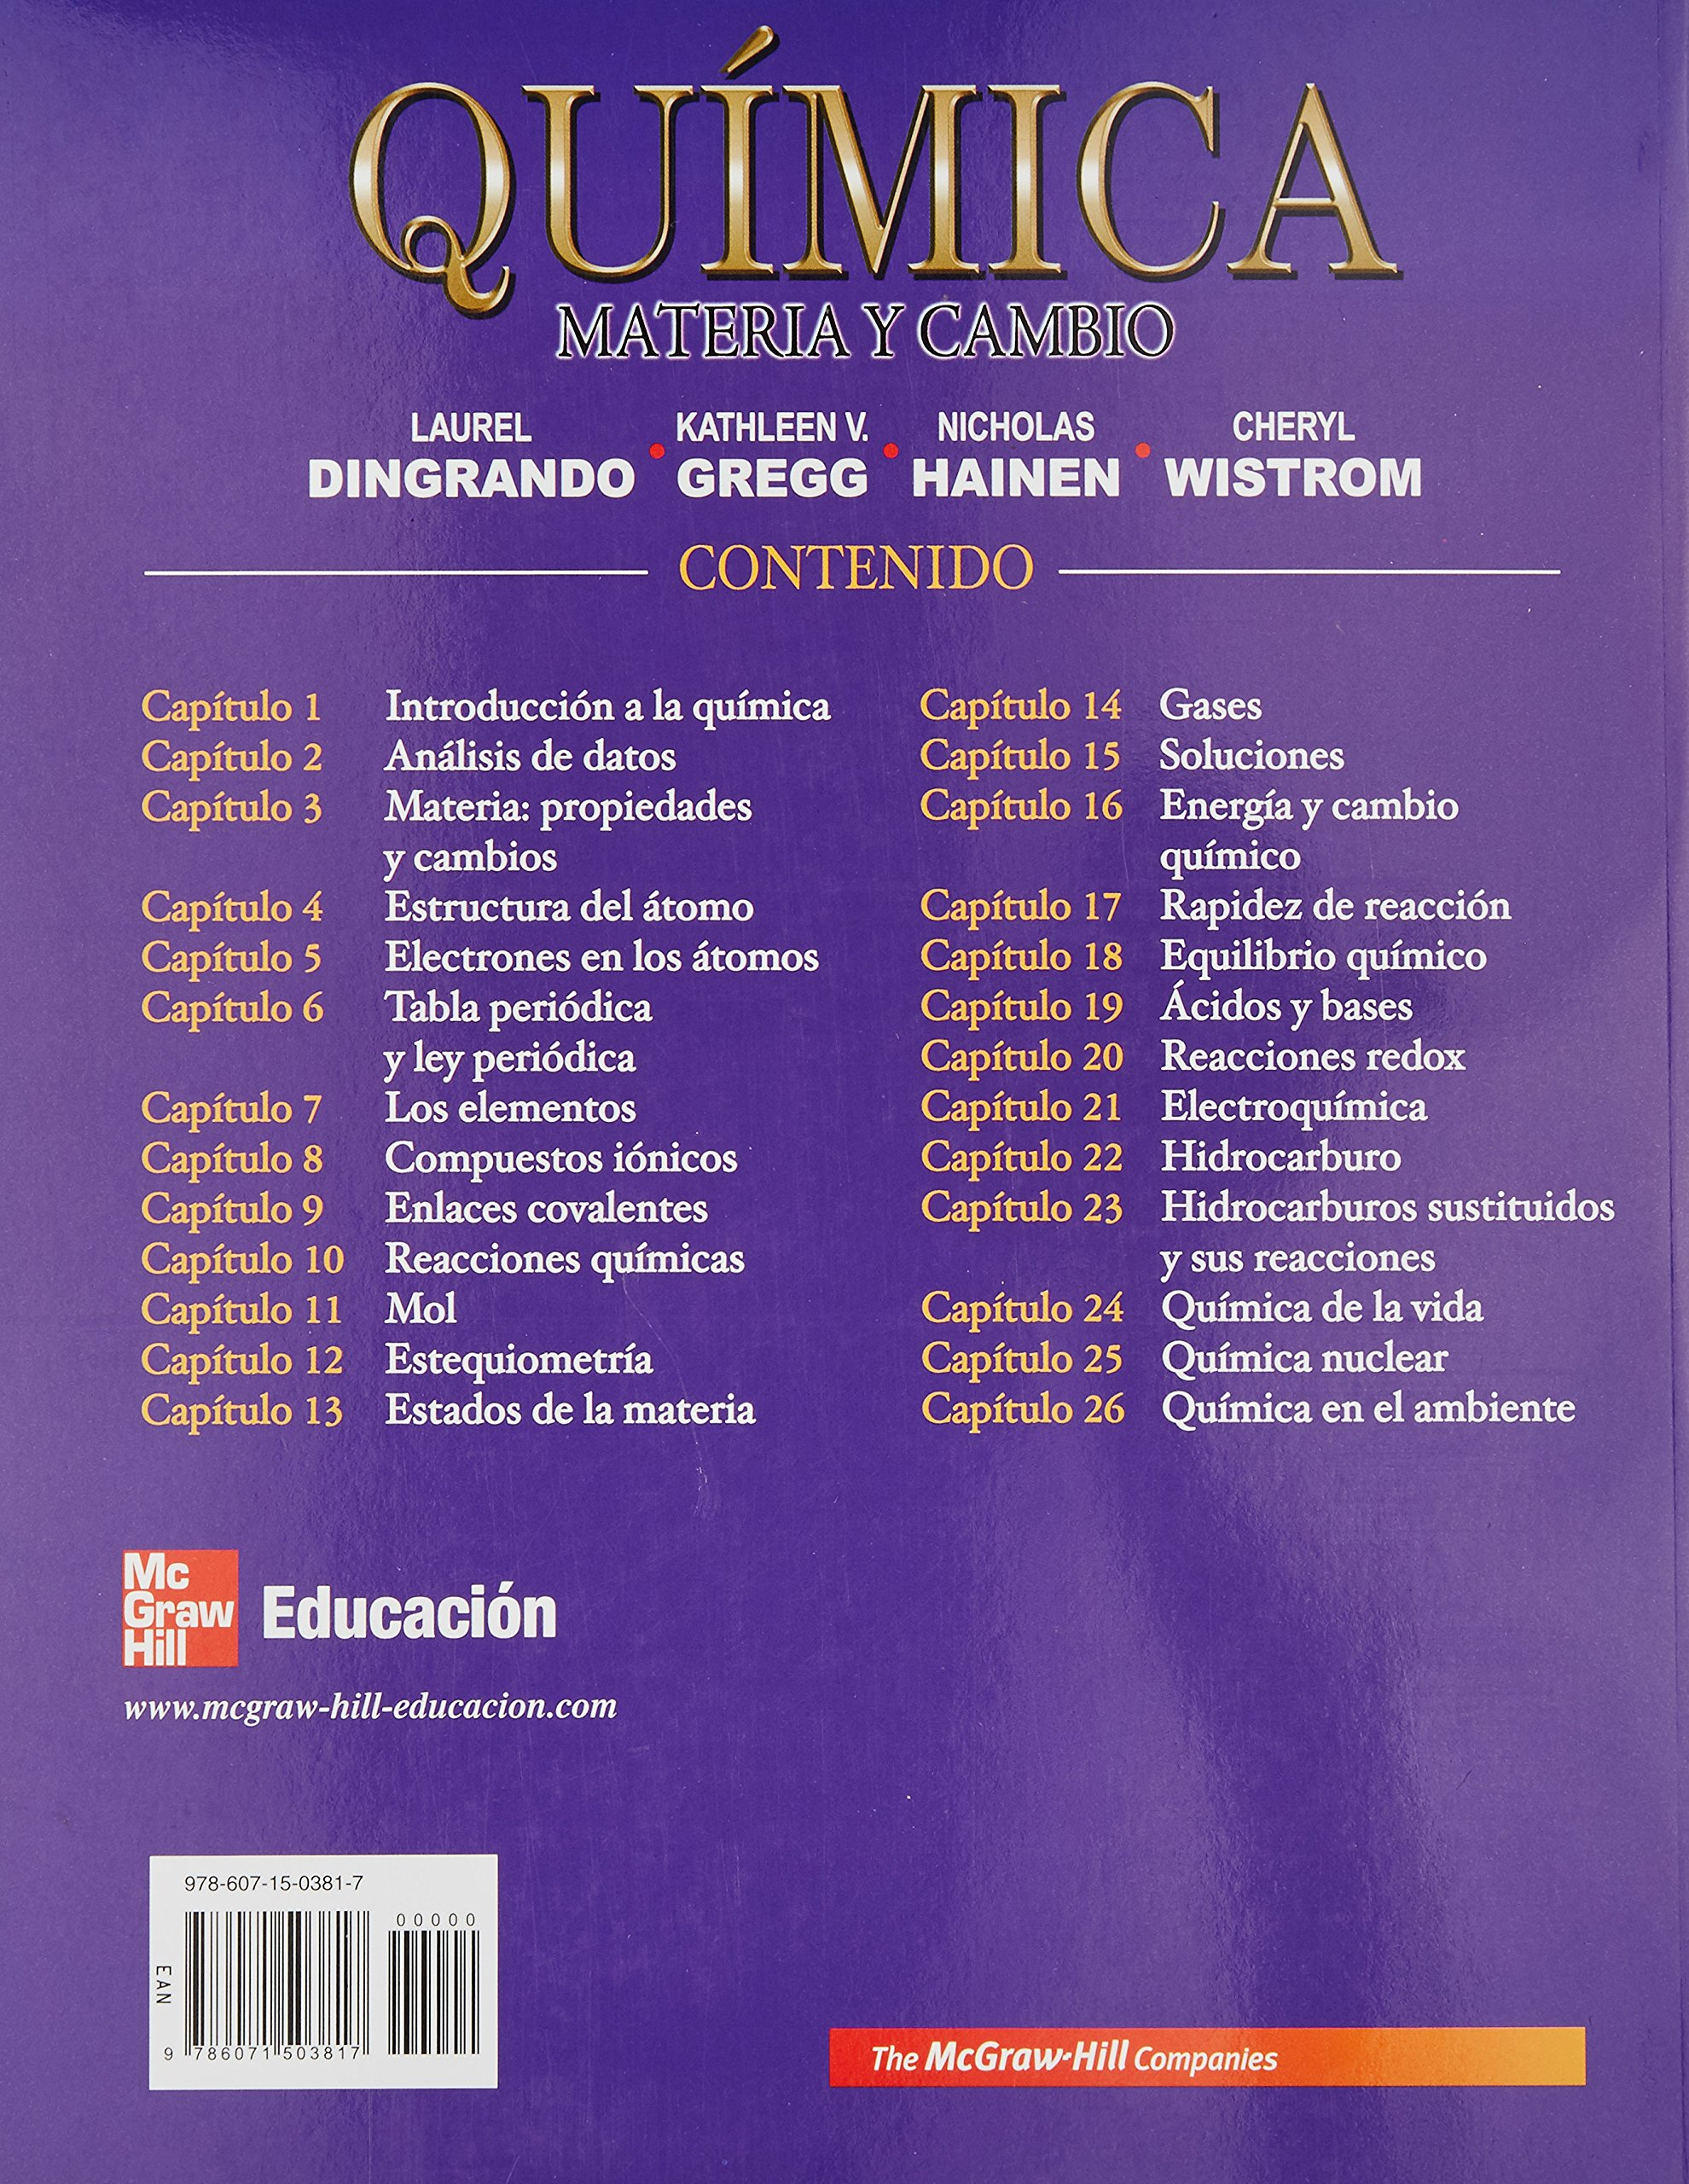 materia y cambio 1ed dingrando 2010 mcgraw hill dingrado laurel 9786071503817 amazoncom books - Tabla Periodica De Los Elementos Mc Graw Hill